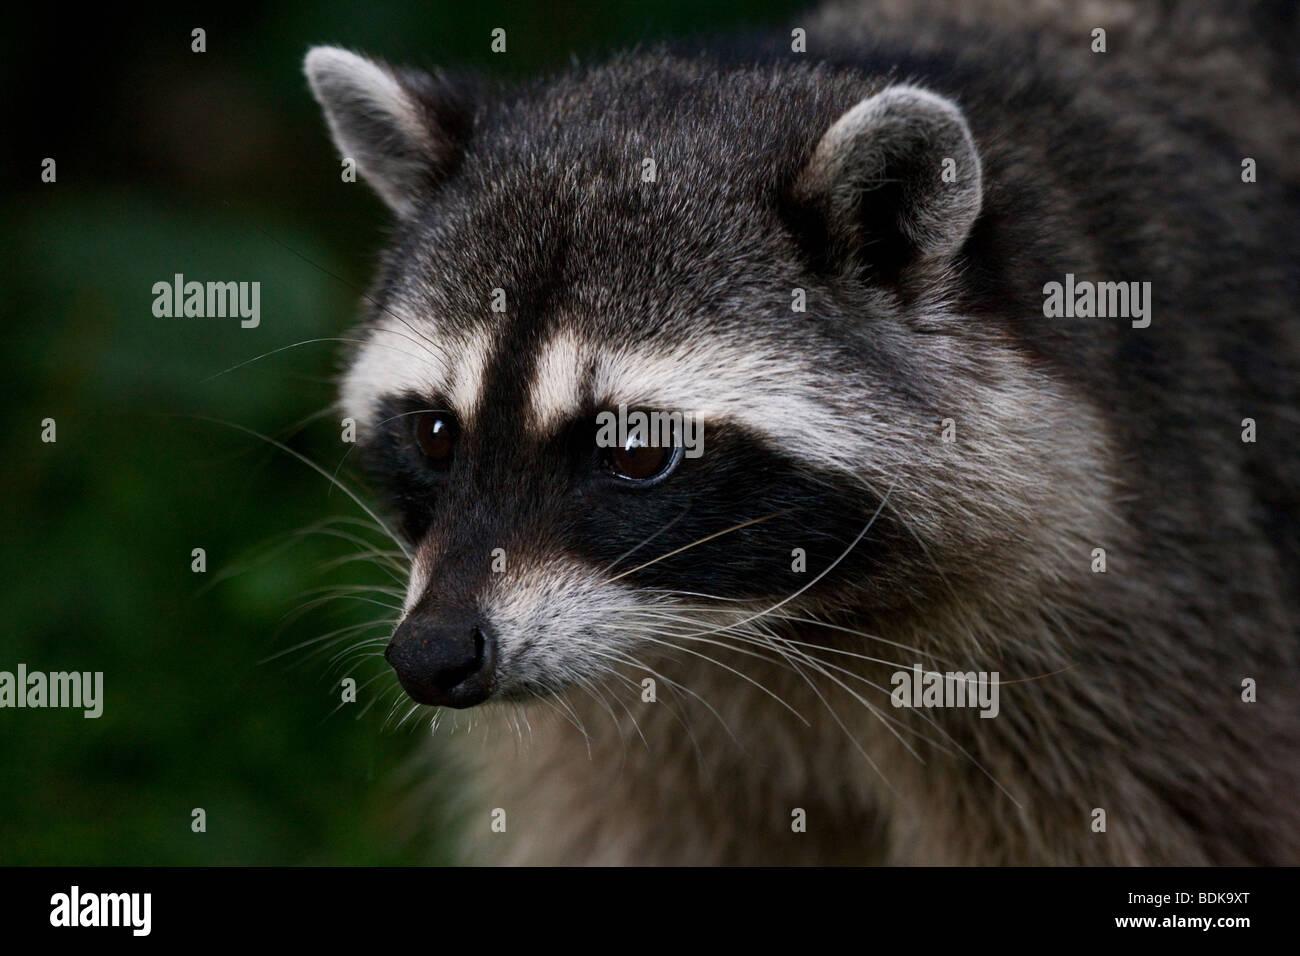 Raccoon in Stanley Park, Vancouver, British Columbia, Canada. - Stock Image